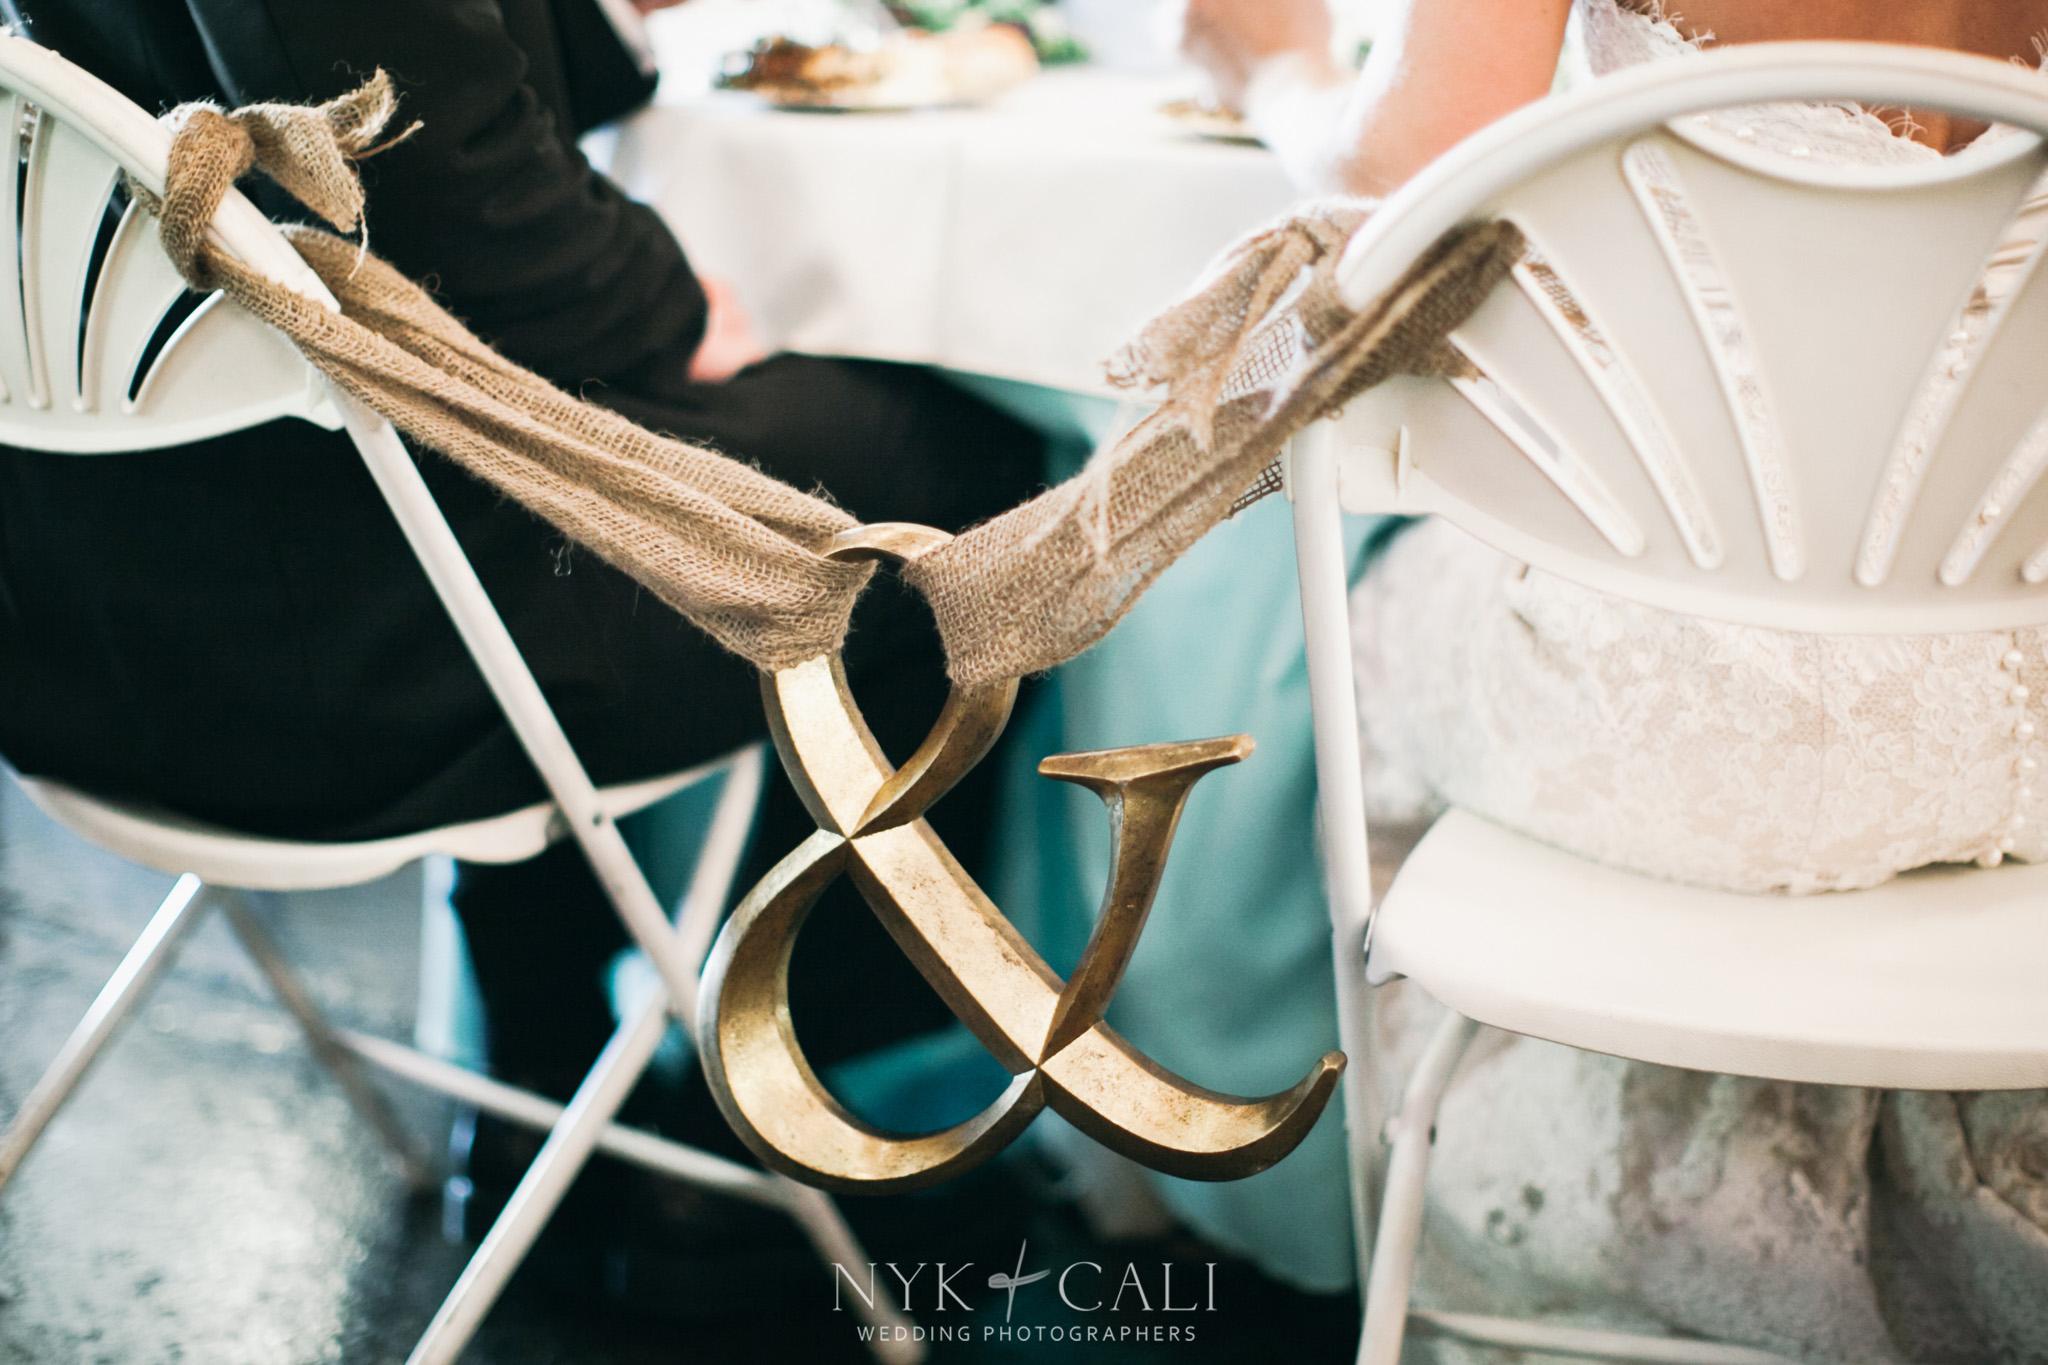 Burlap and Lace Bride - Locklane Weddings & Events, Nashville Wedding Planner